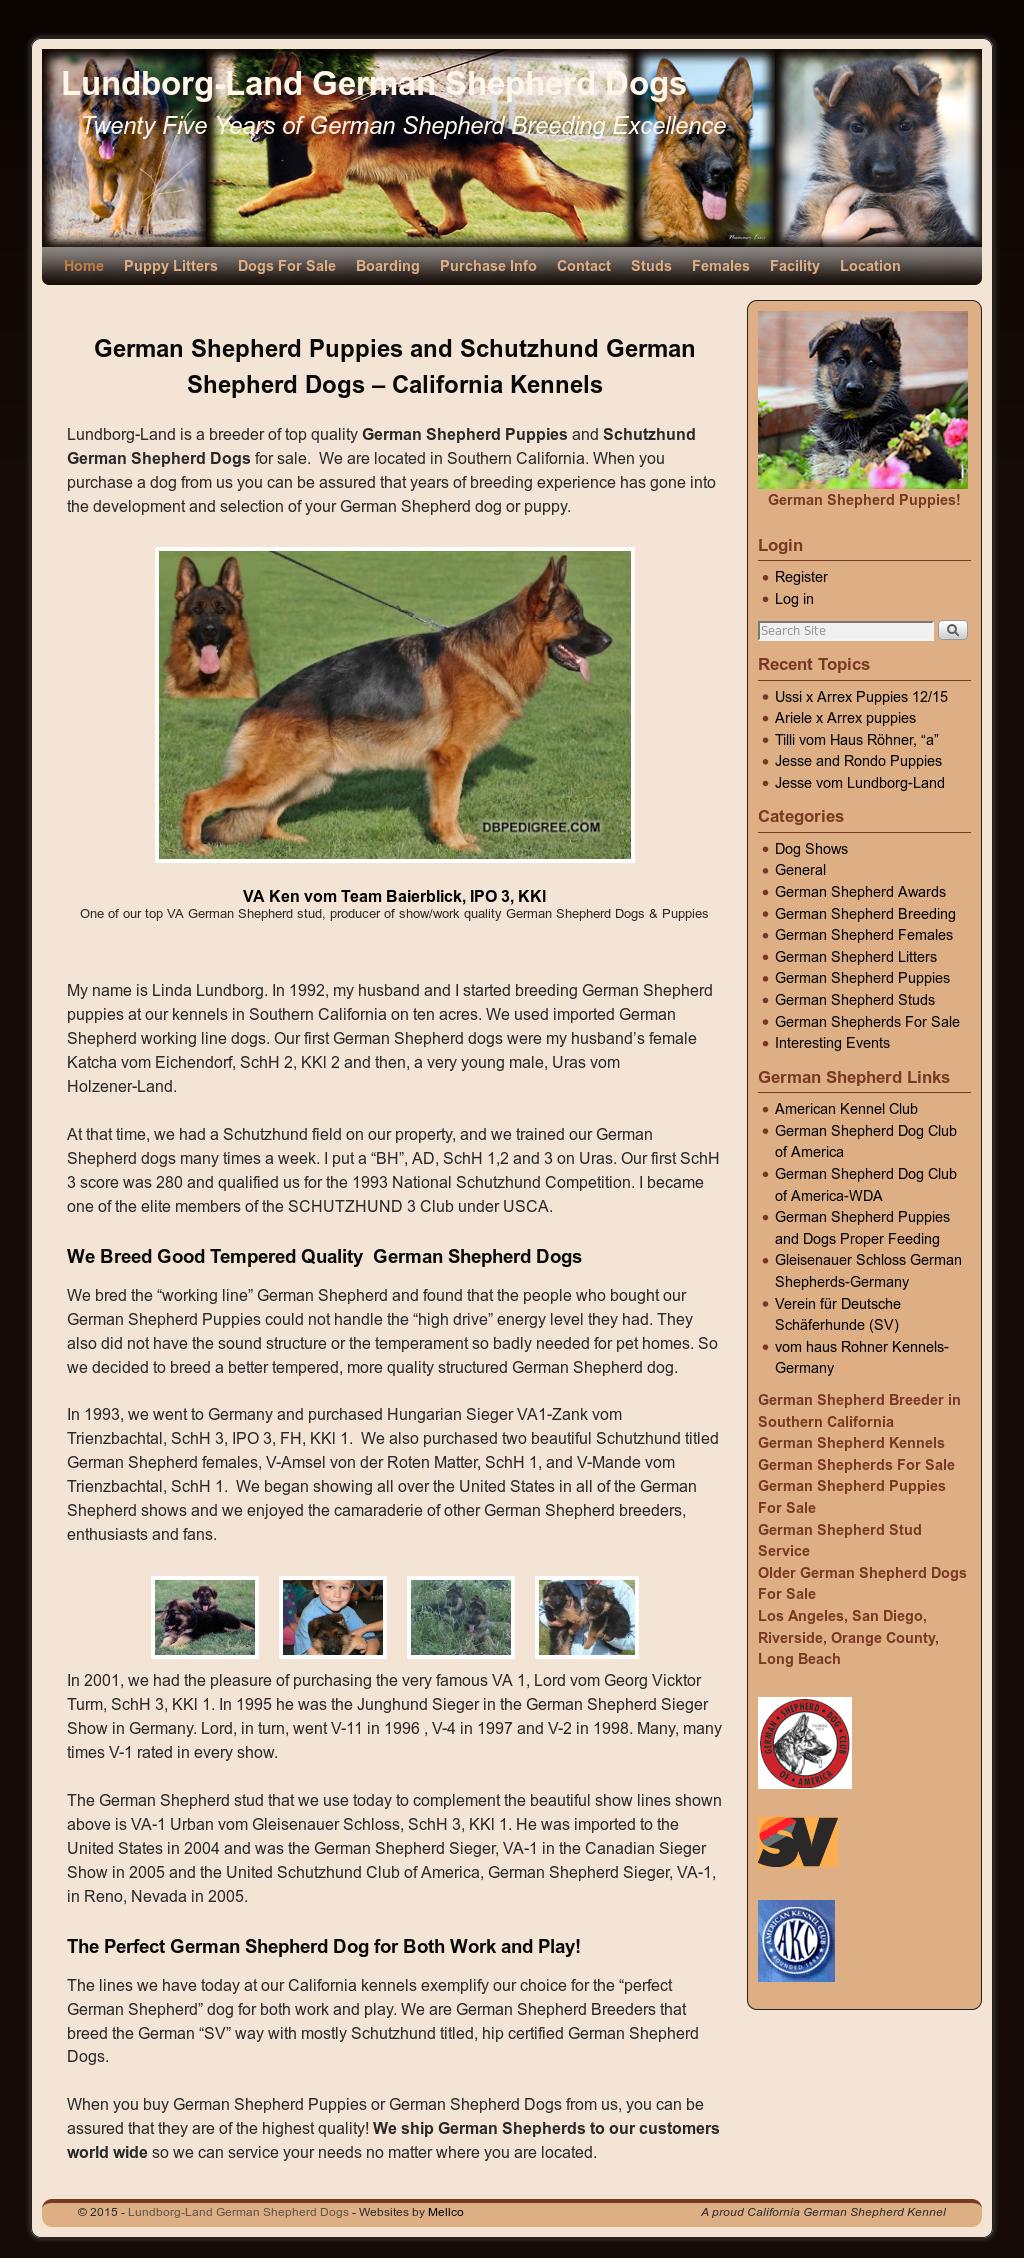 Lundborg-land German Shepherd Dogs Competitors, Revenue and